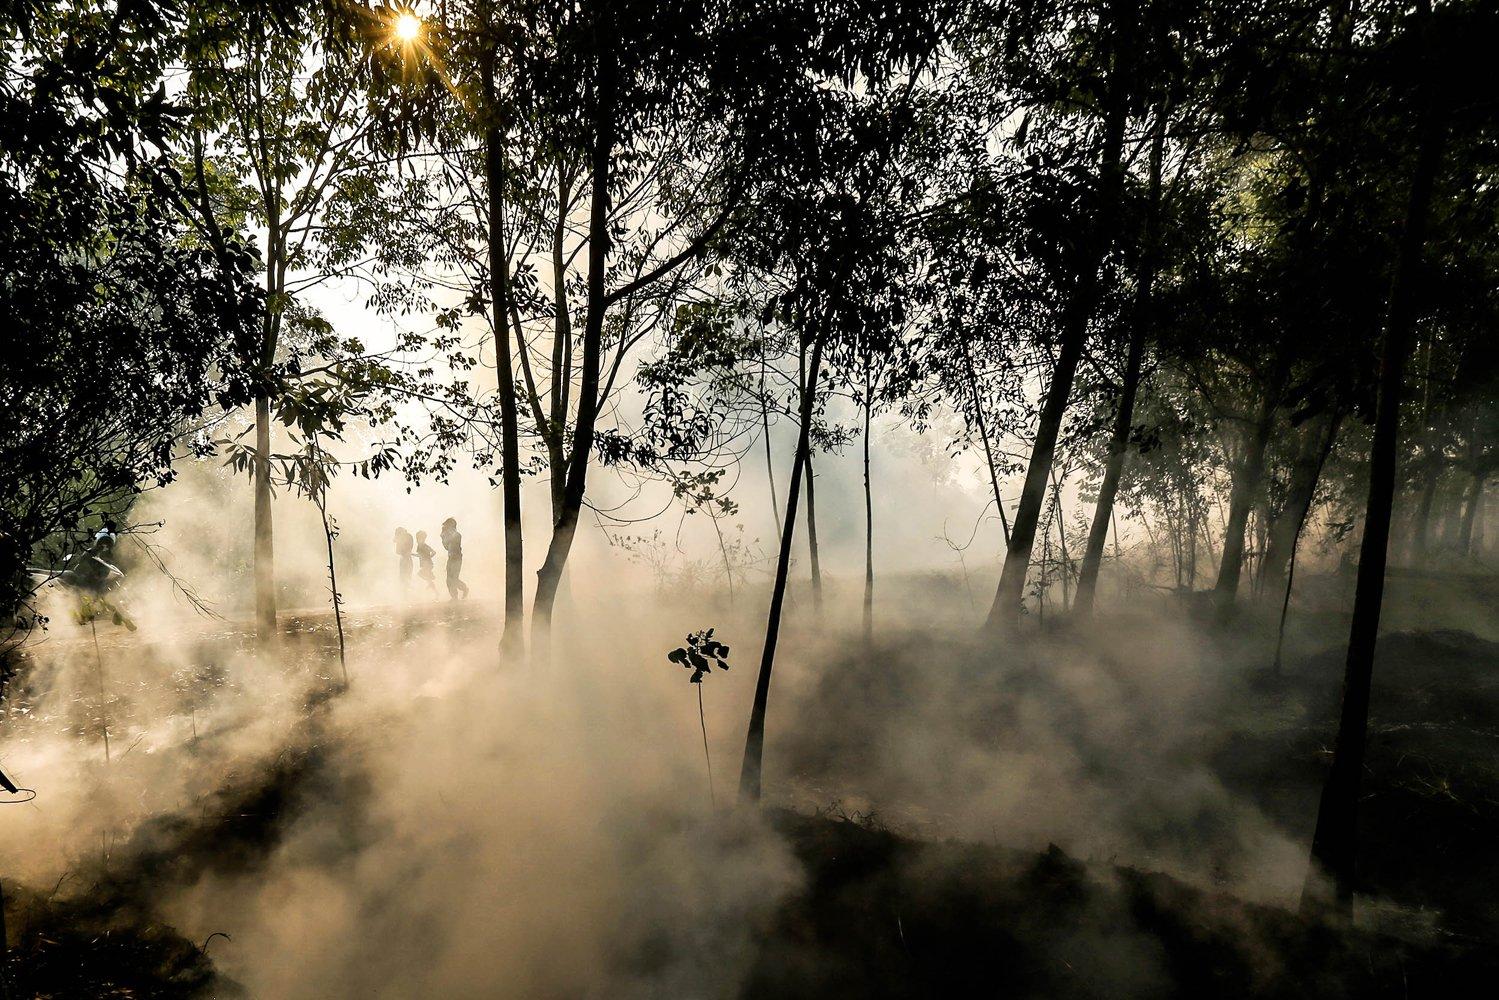 Sejumlah anak melintasi asap kebakaran lahan yang merambat ke kebun karet di Desa Soak Batok, Indralaya Utara, Ogan Ilir, Sumatera Selatan, Selasa (10/9/2019). Berdasarkan citra satelit Lapan terdapat 211 titik api di kawasan Sumatera Selatan.